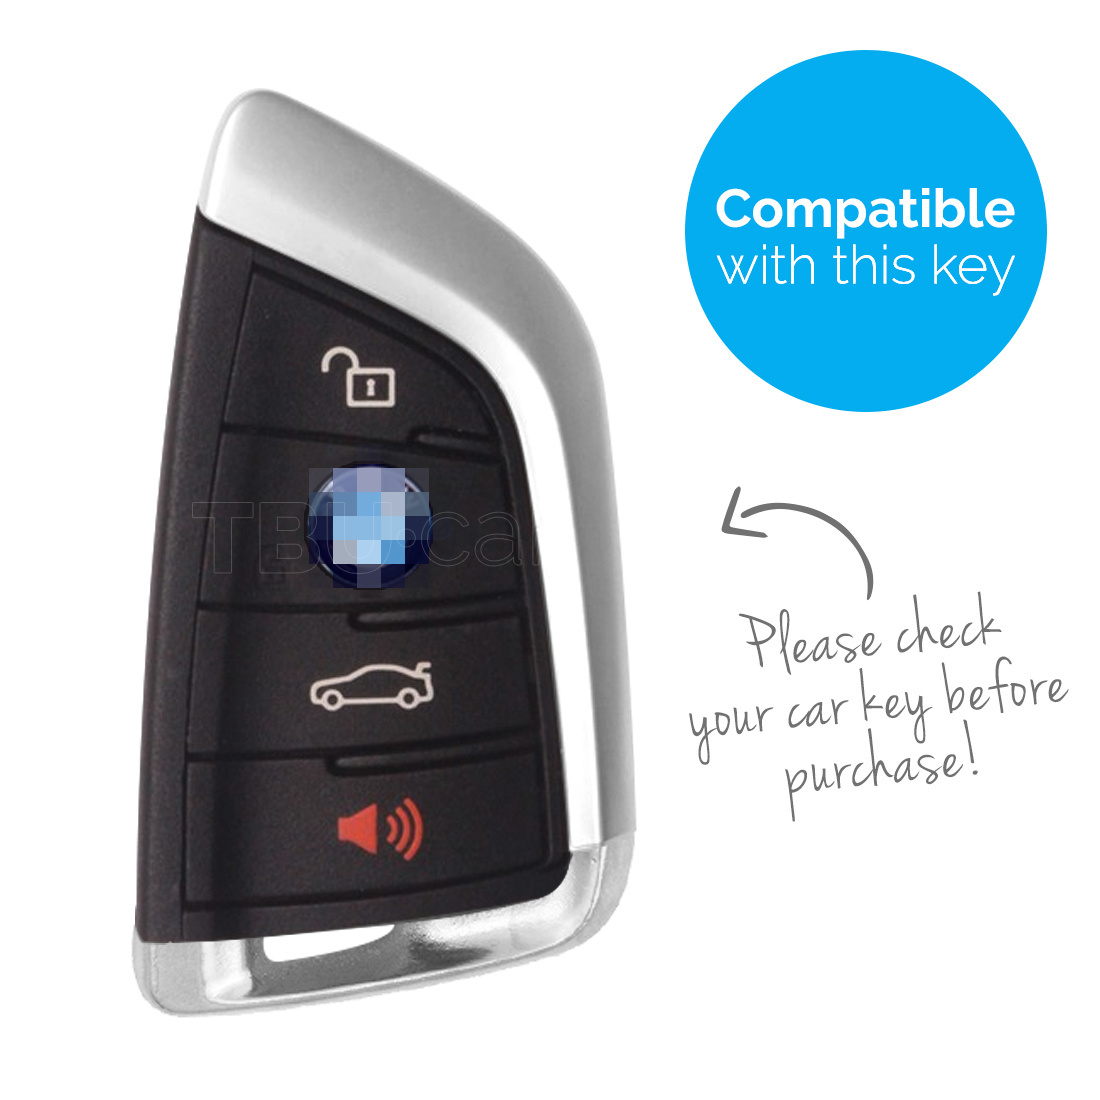 TBU car TBU car Funda Carcasa llave compatible con BMW - Funda de Silicona - Cover de Llave Coche - Fluor Rosa